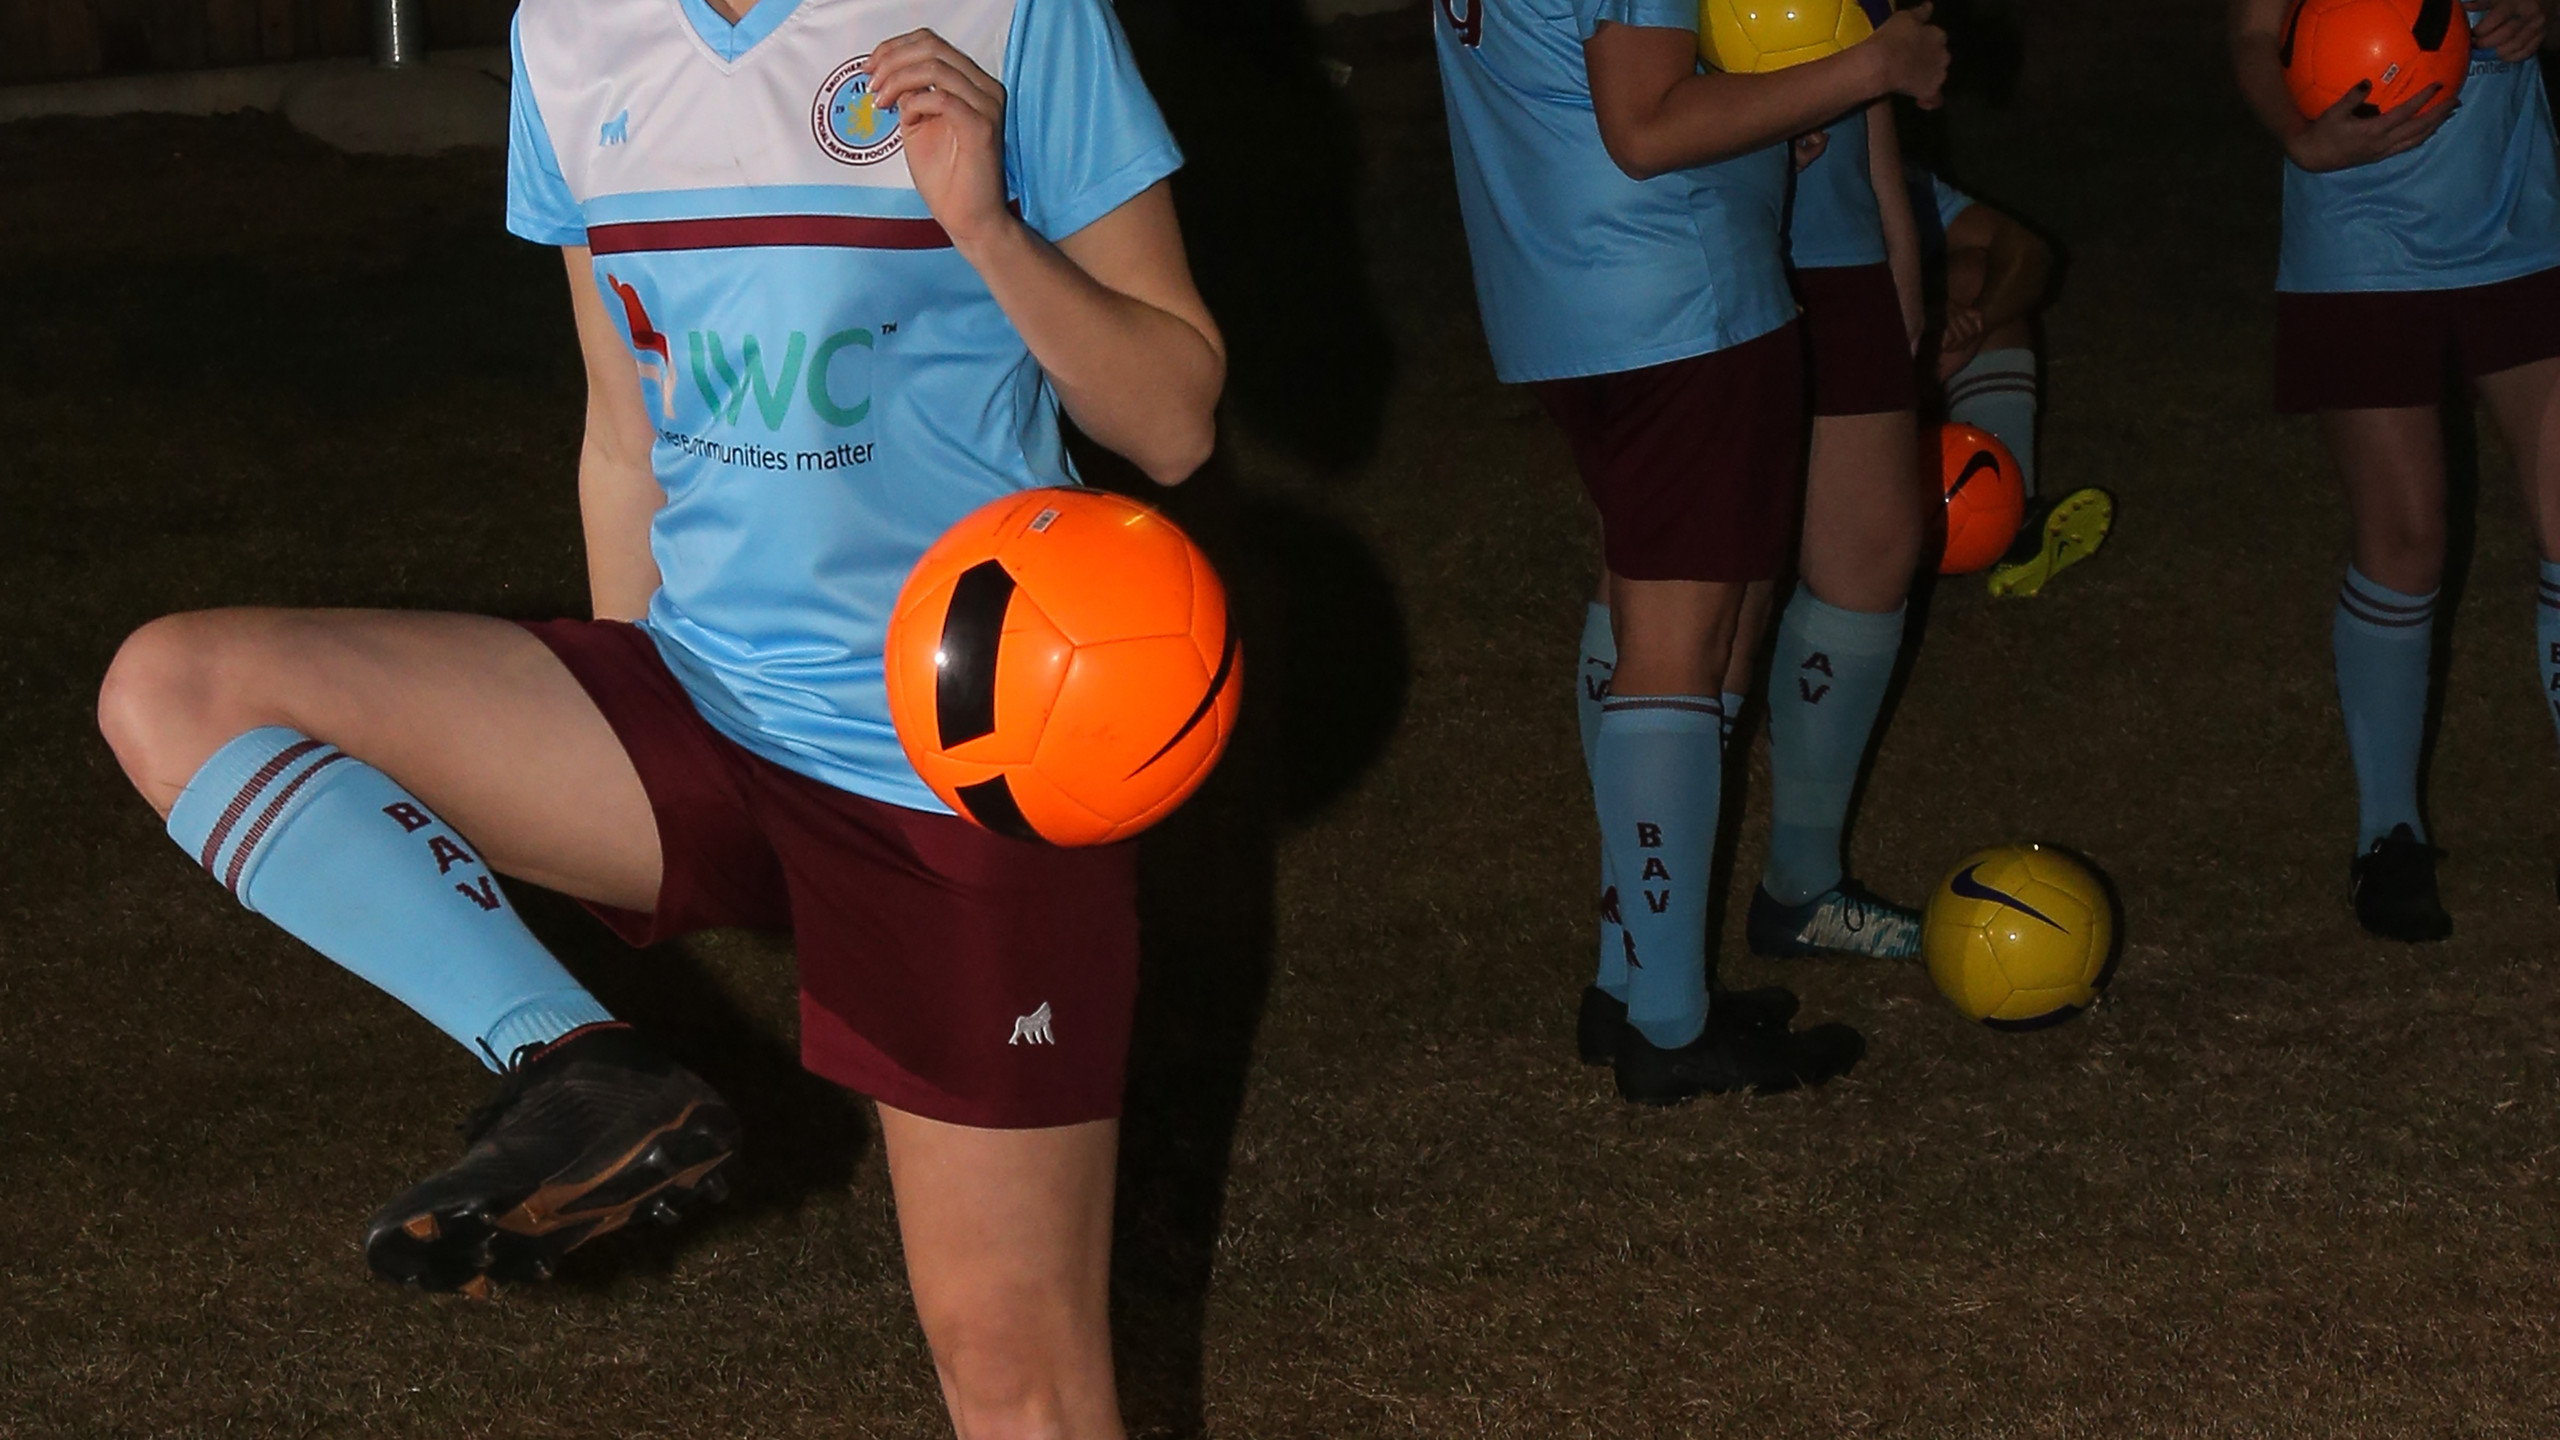 IWC sponsors women's football team